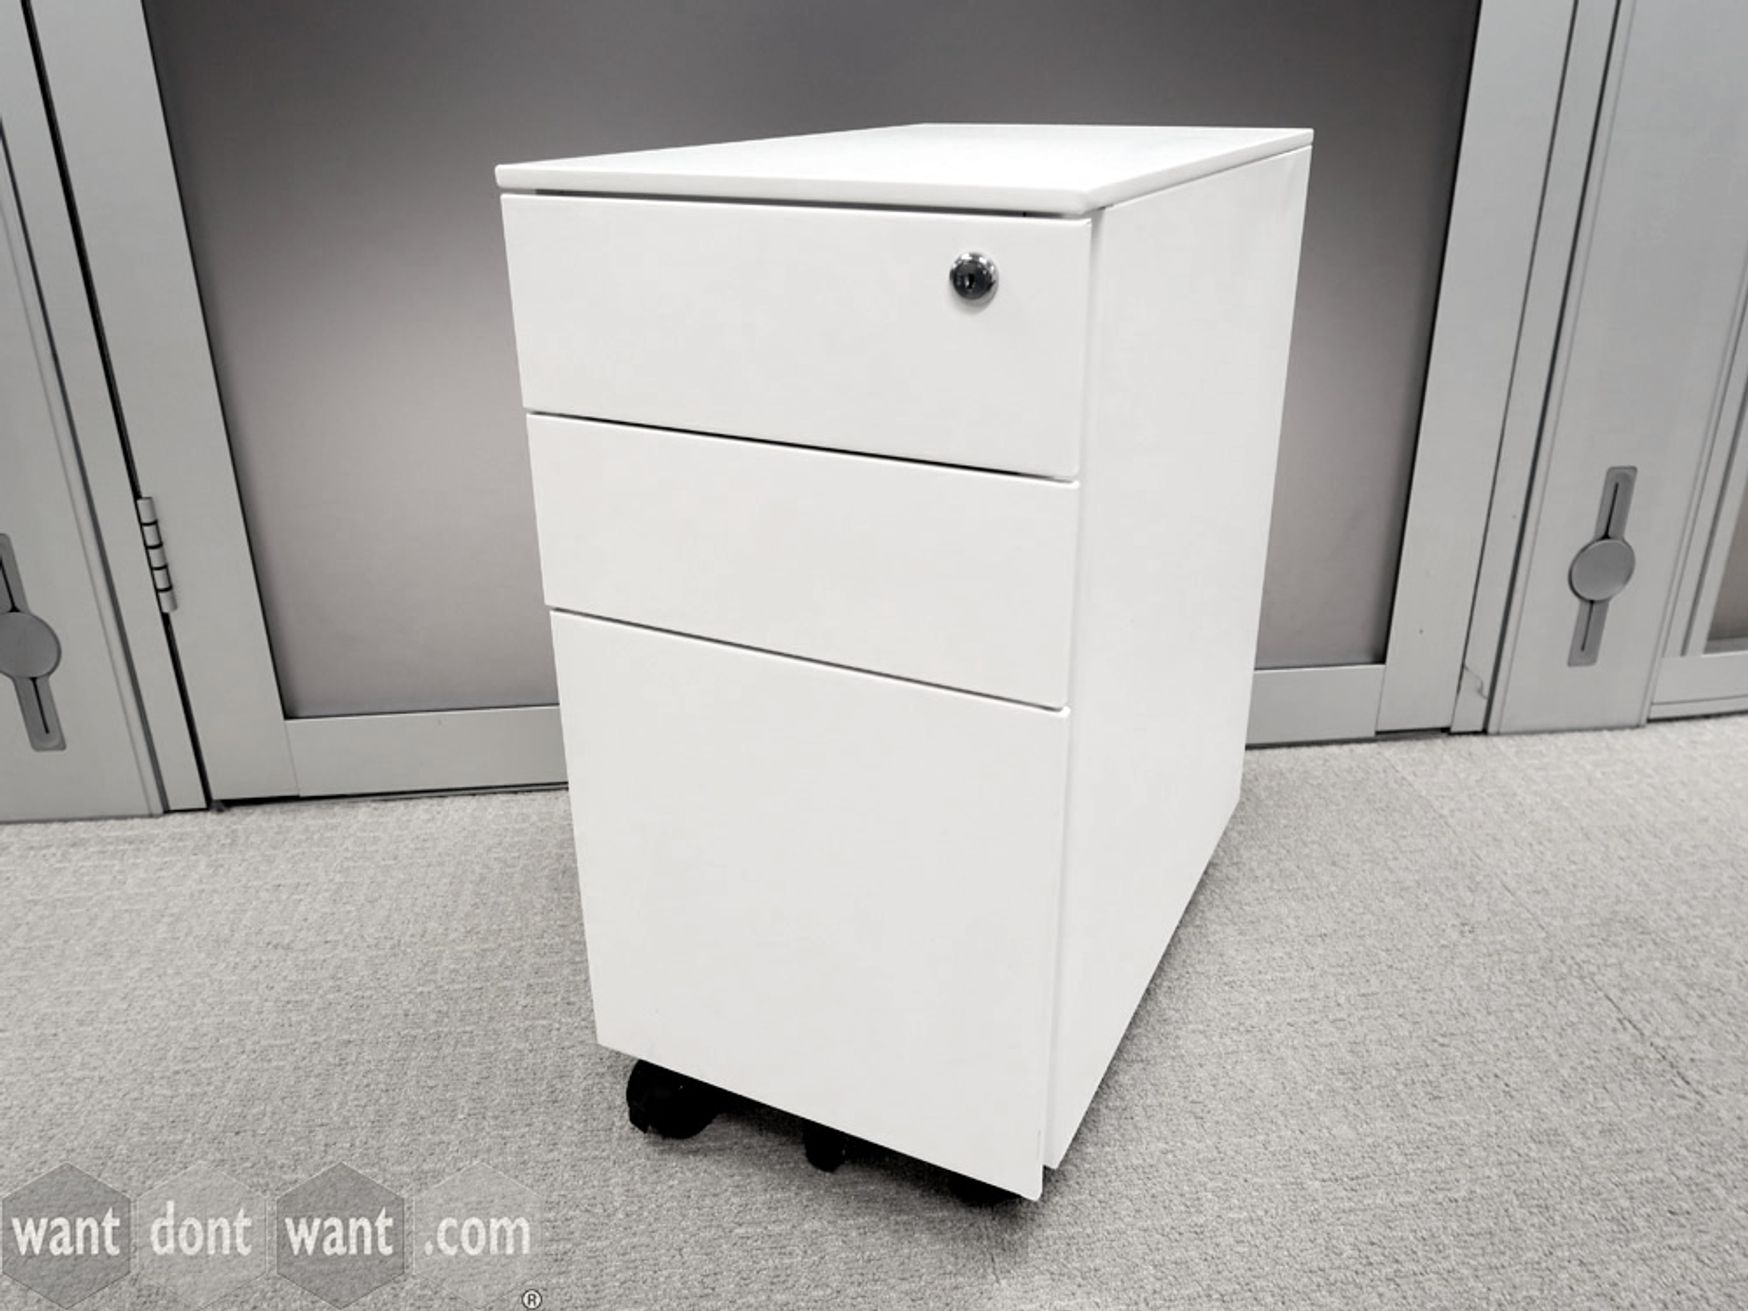 Used Steel Slim White Under Desk Mobile Pedestal